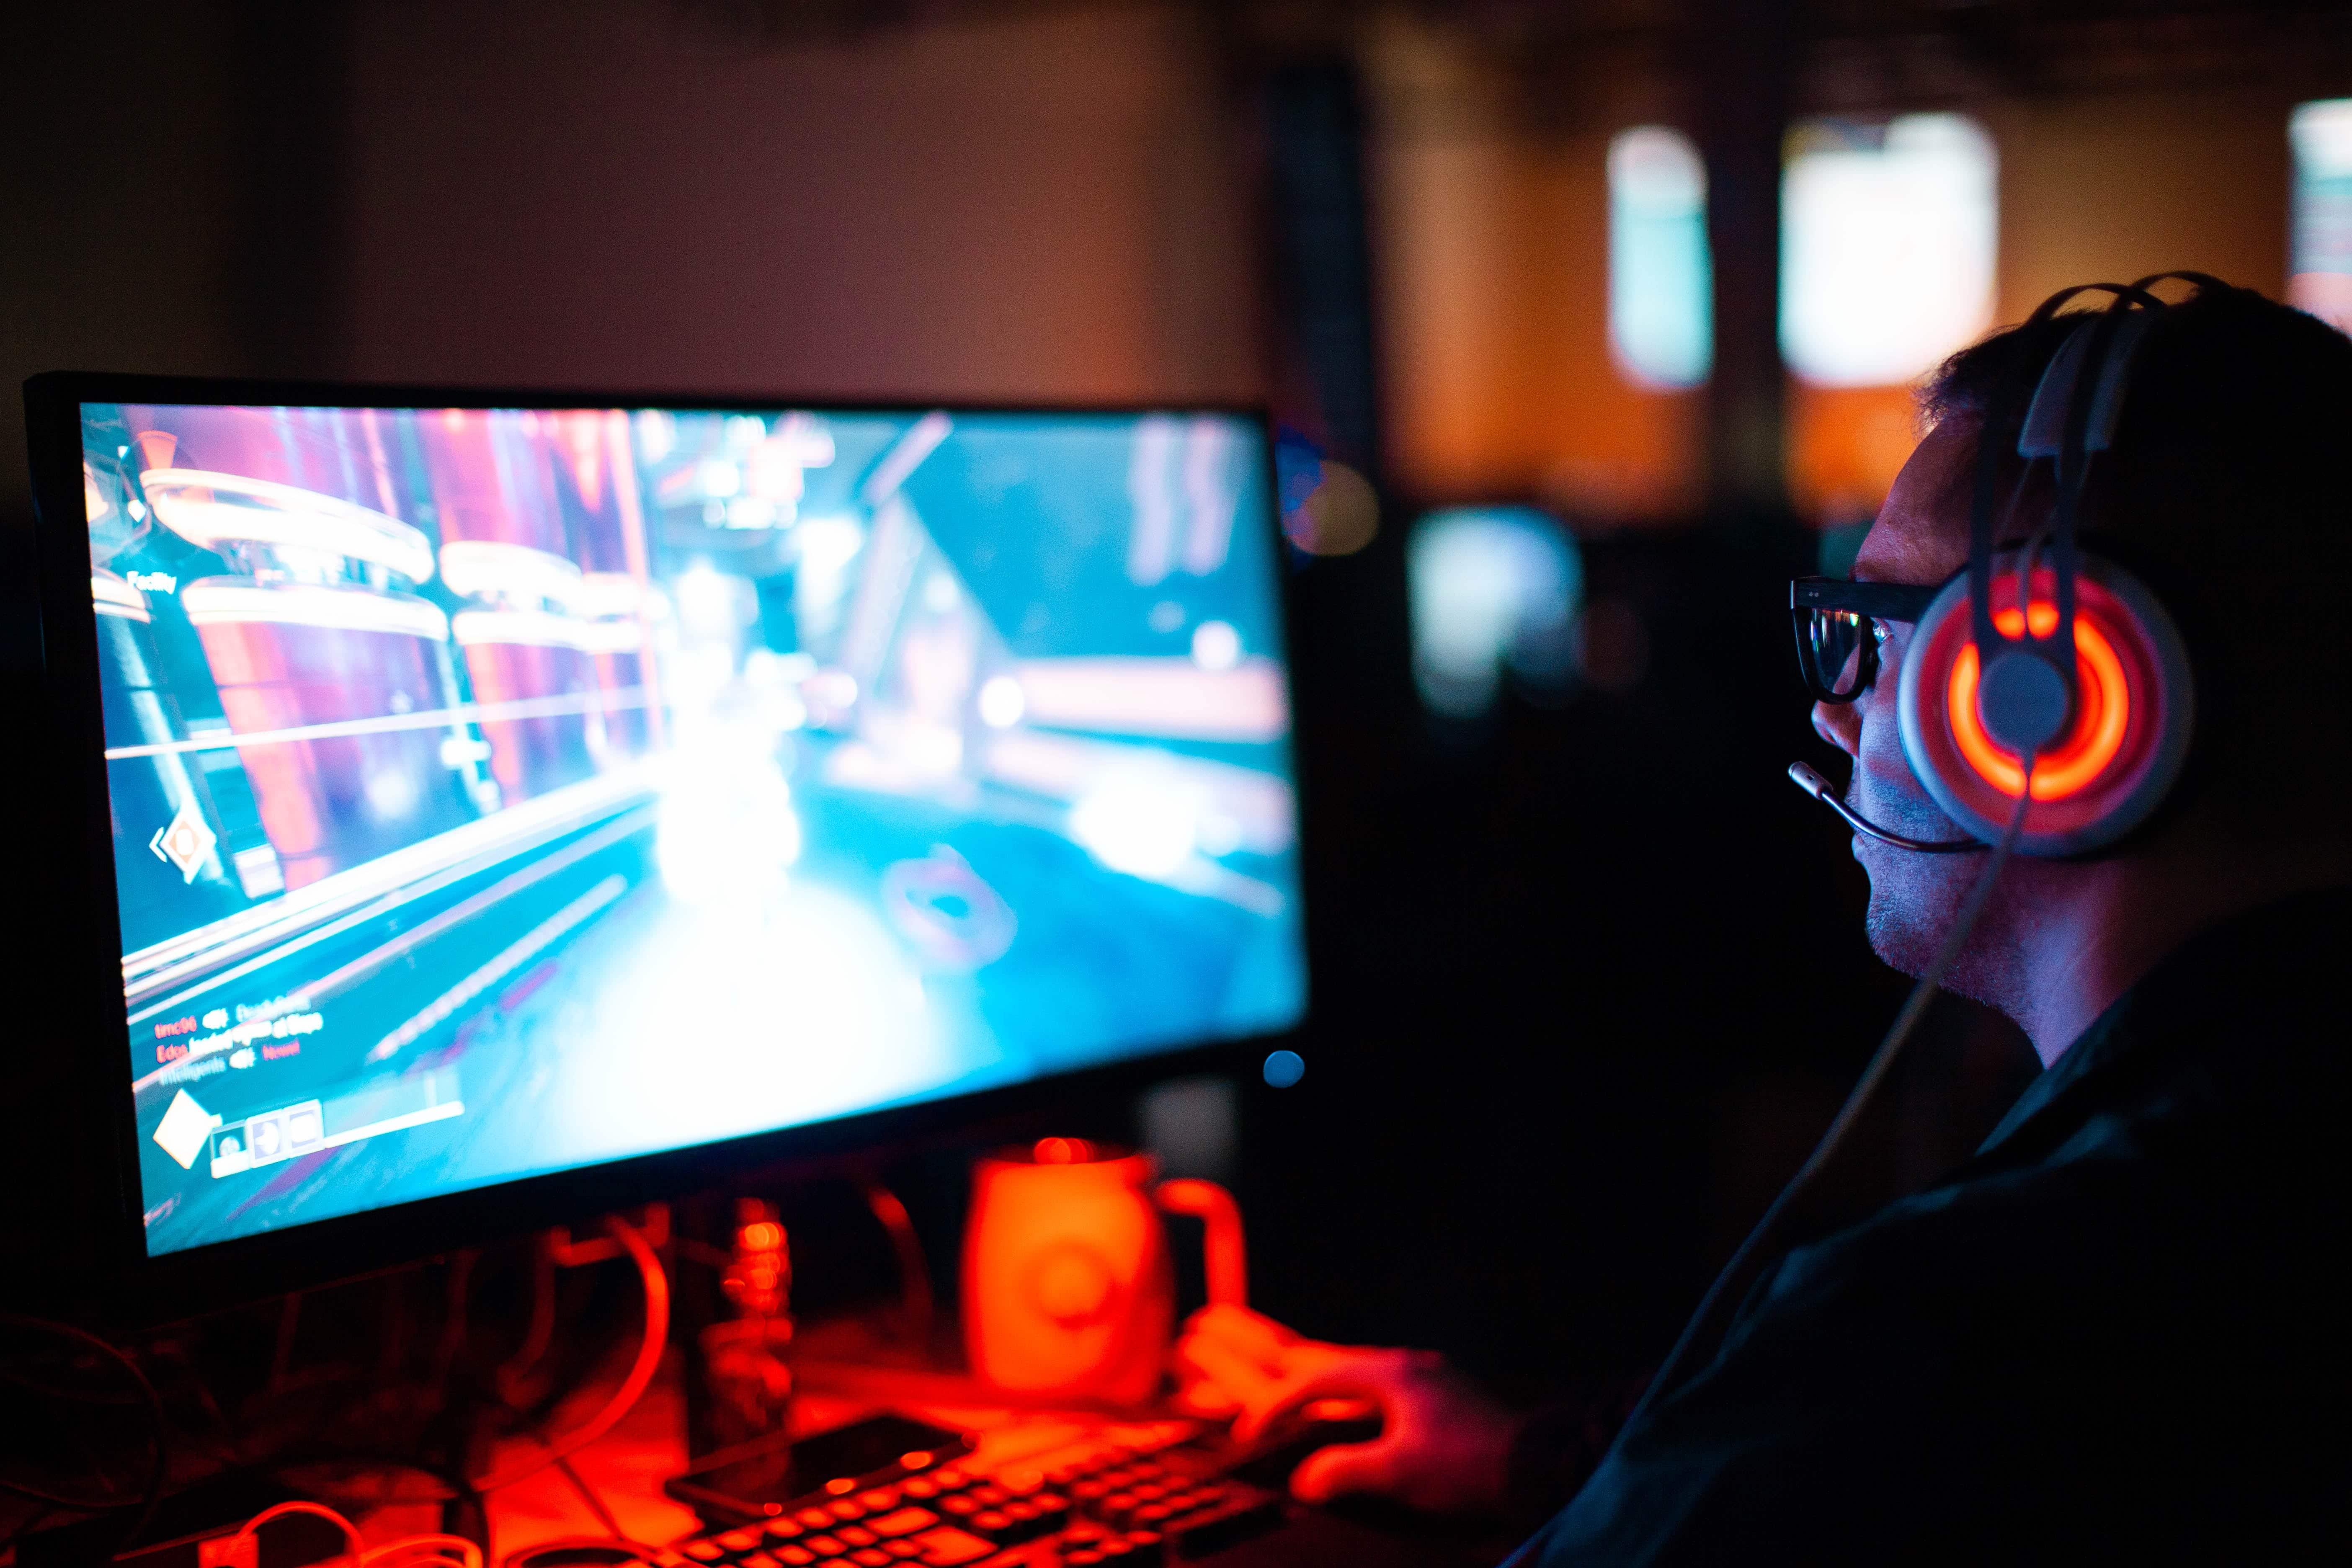 Casque audio gamer : Guide d'achat 2020, comparatif et avis 1